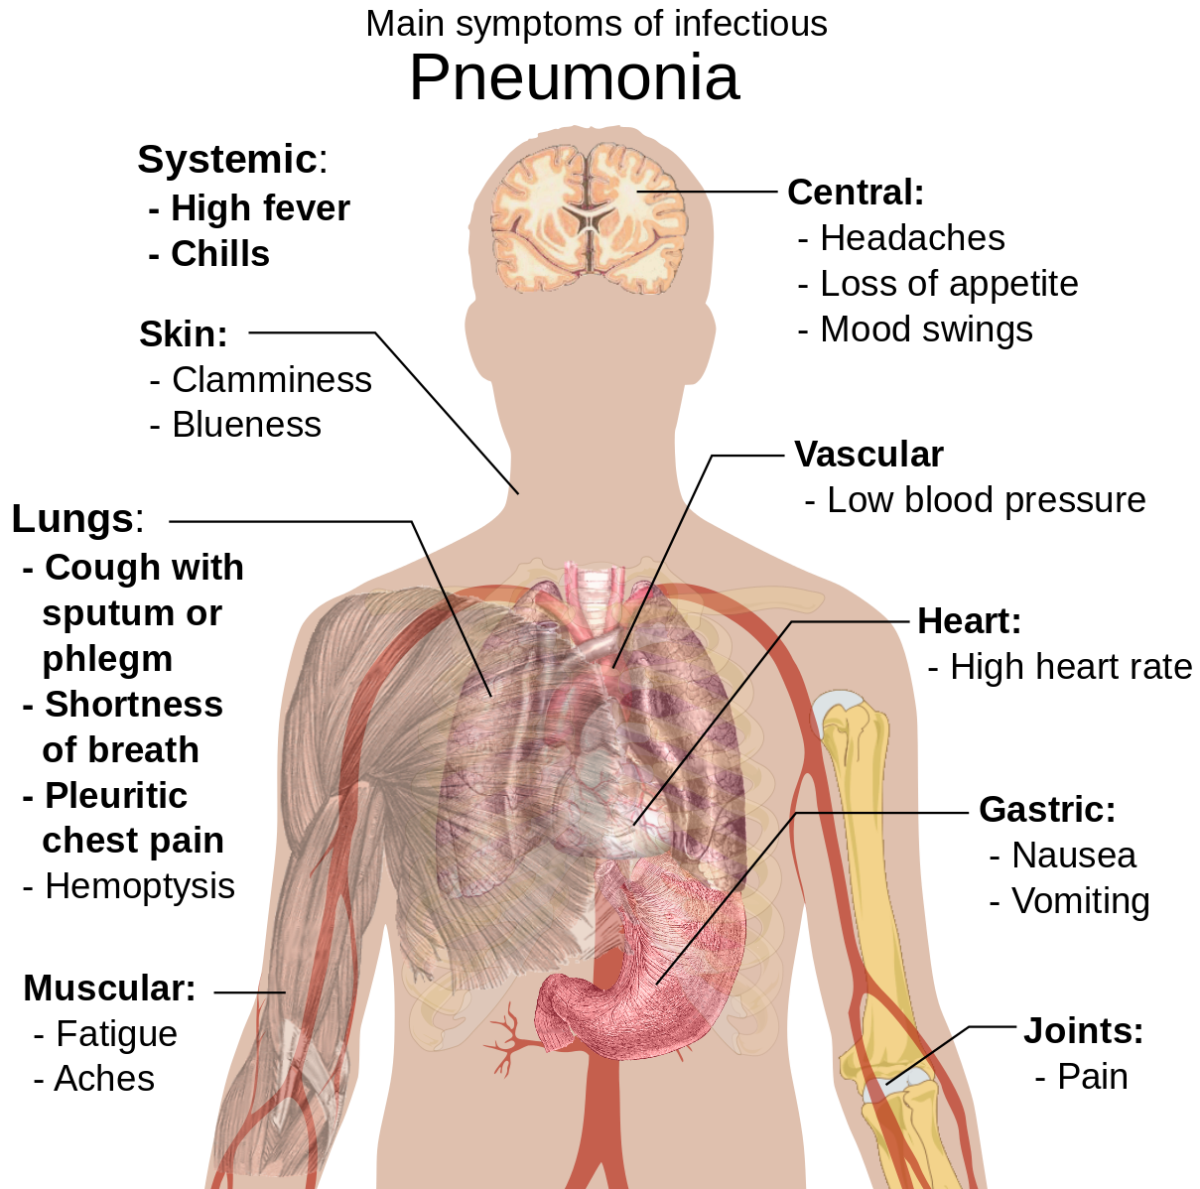 Possible symptoms of pneumonia